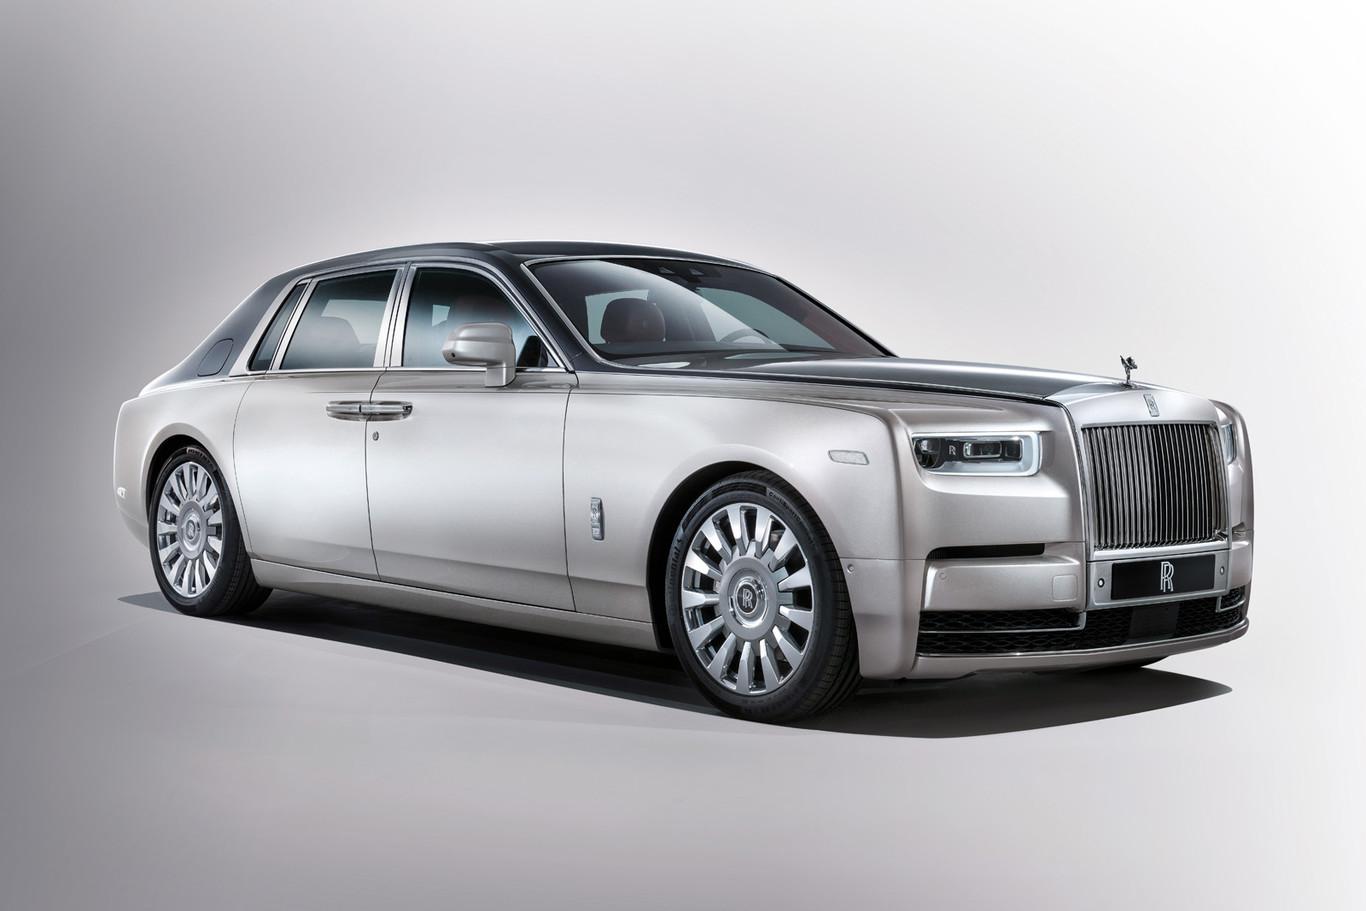 Funda De Coche Interior para Rolls Royce Silver Wraith 11